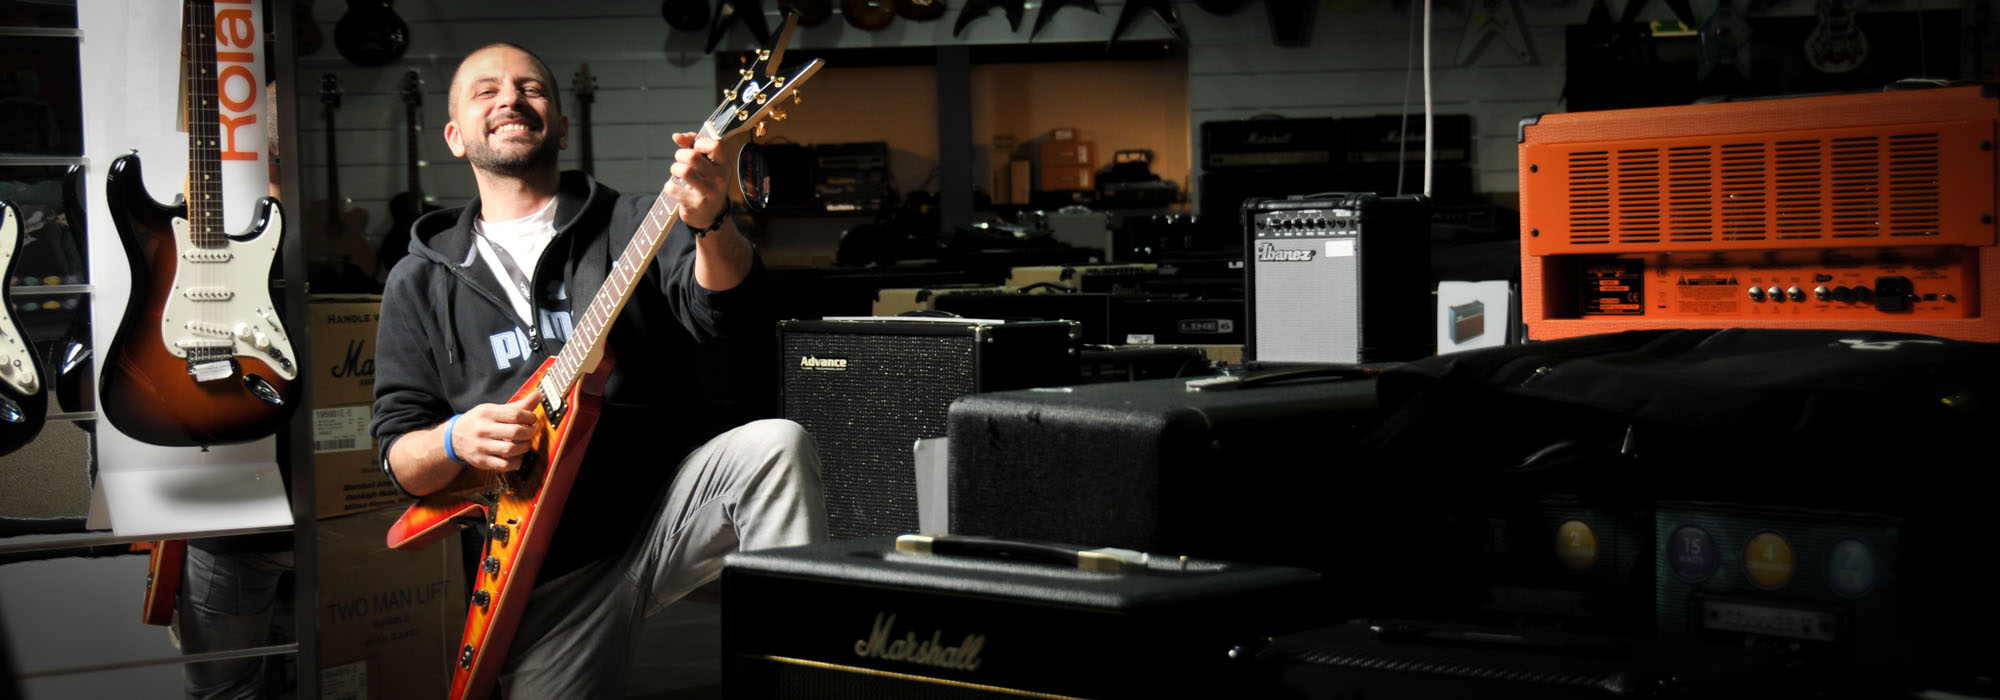 david danieli chitarre